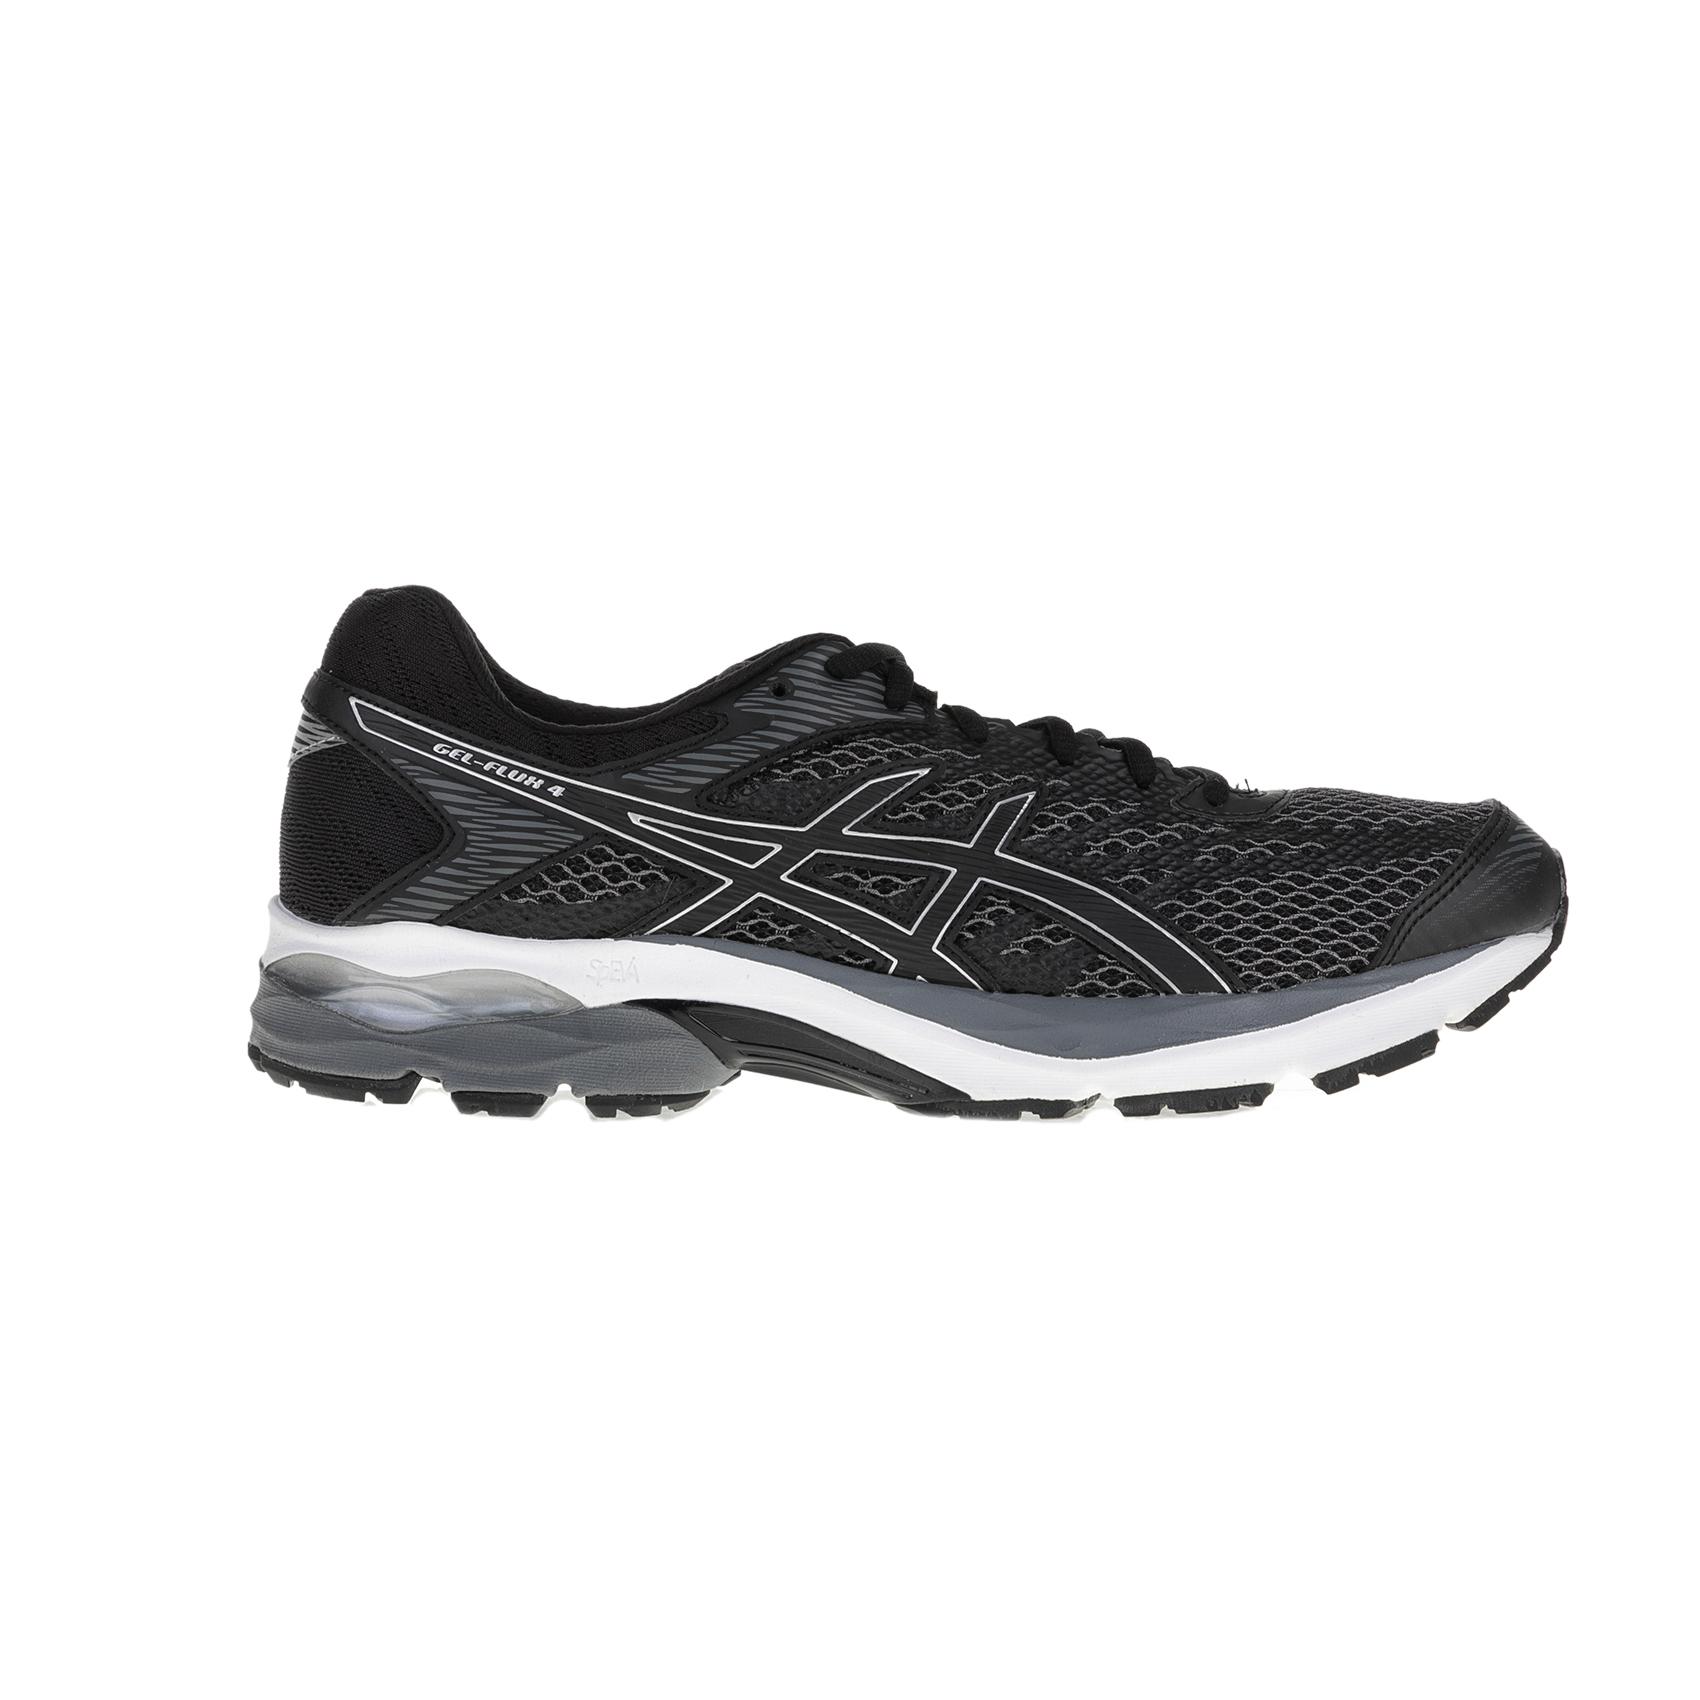 ASICS – Ανδρικά παπούτσια Asics GEL-FLUX 4 μαύρα